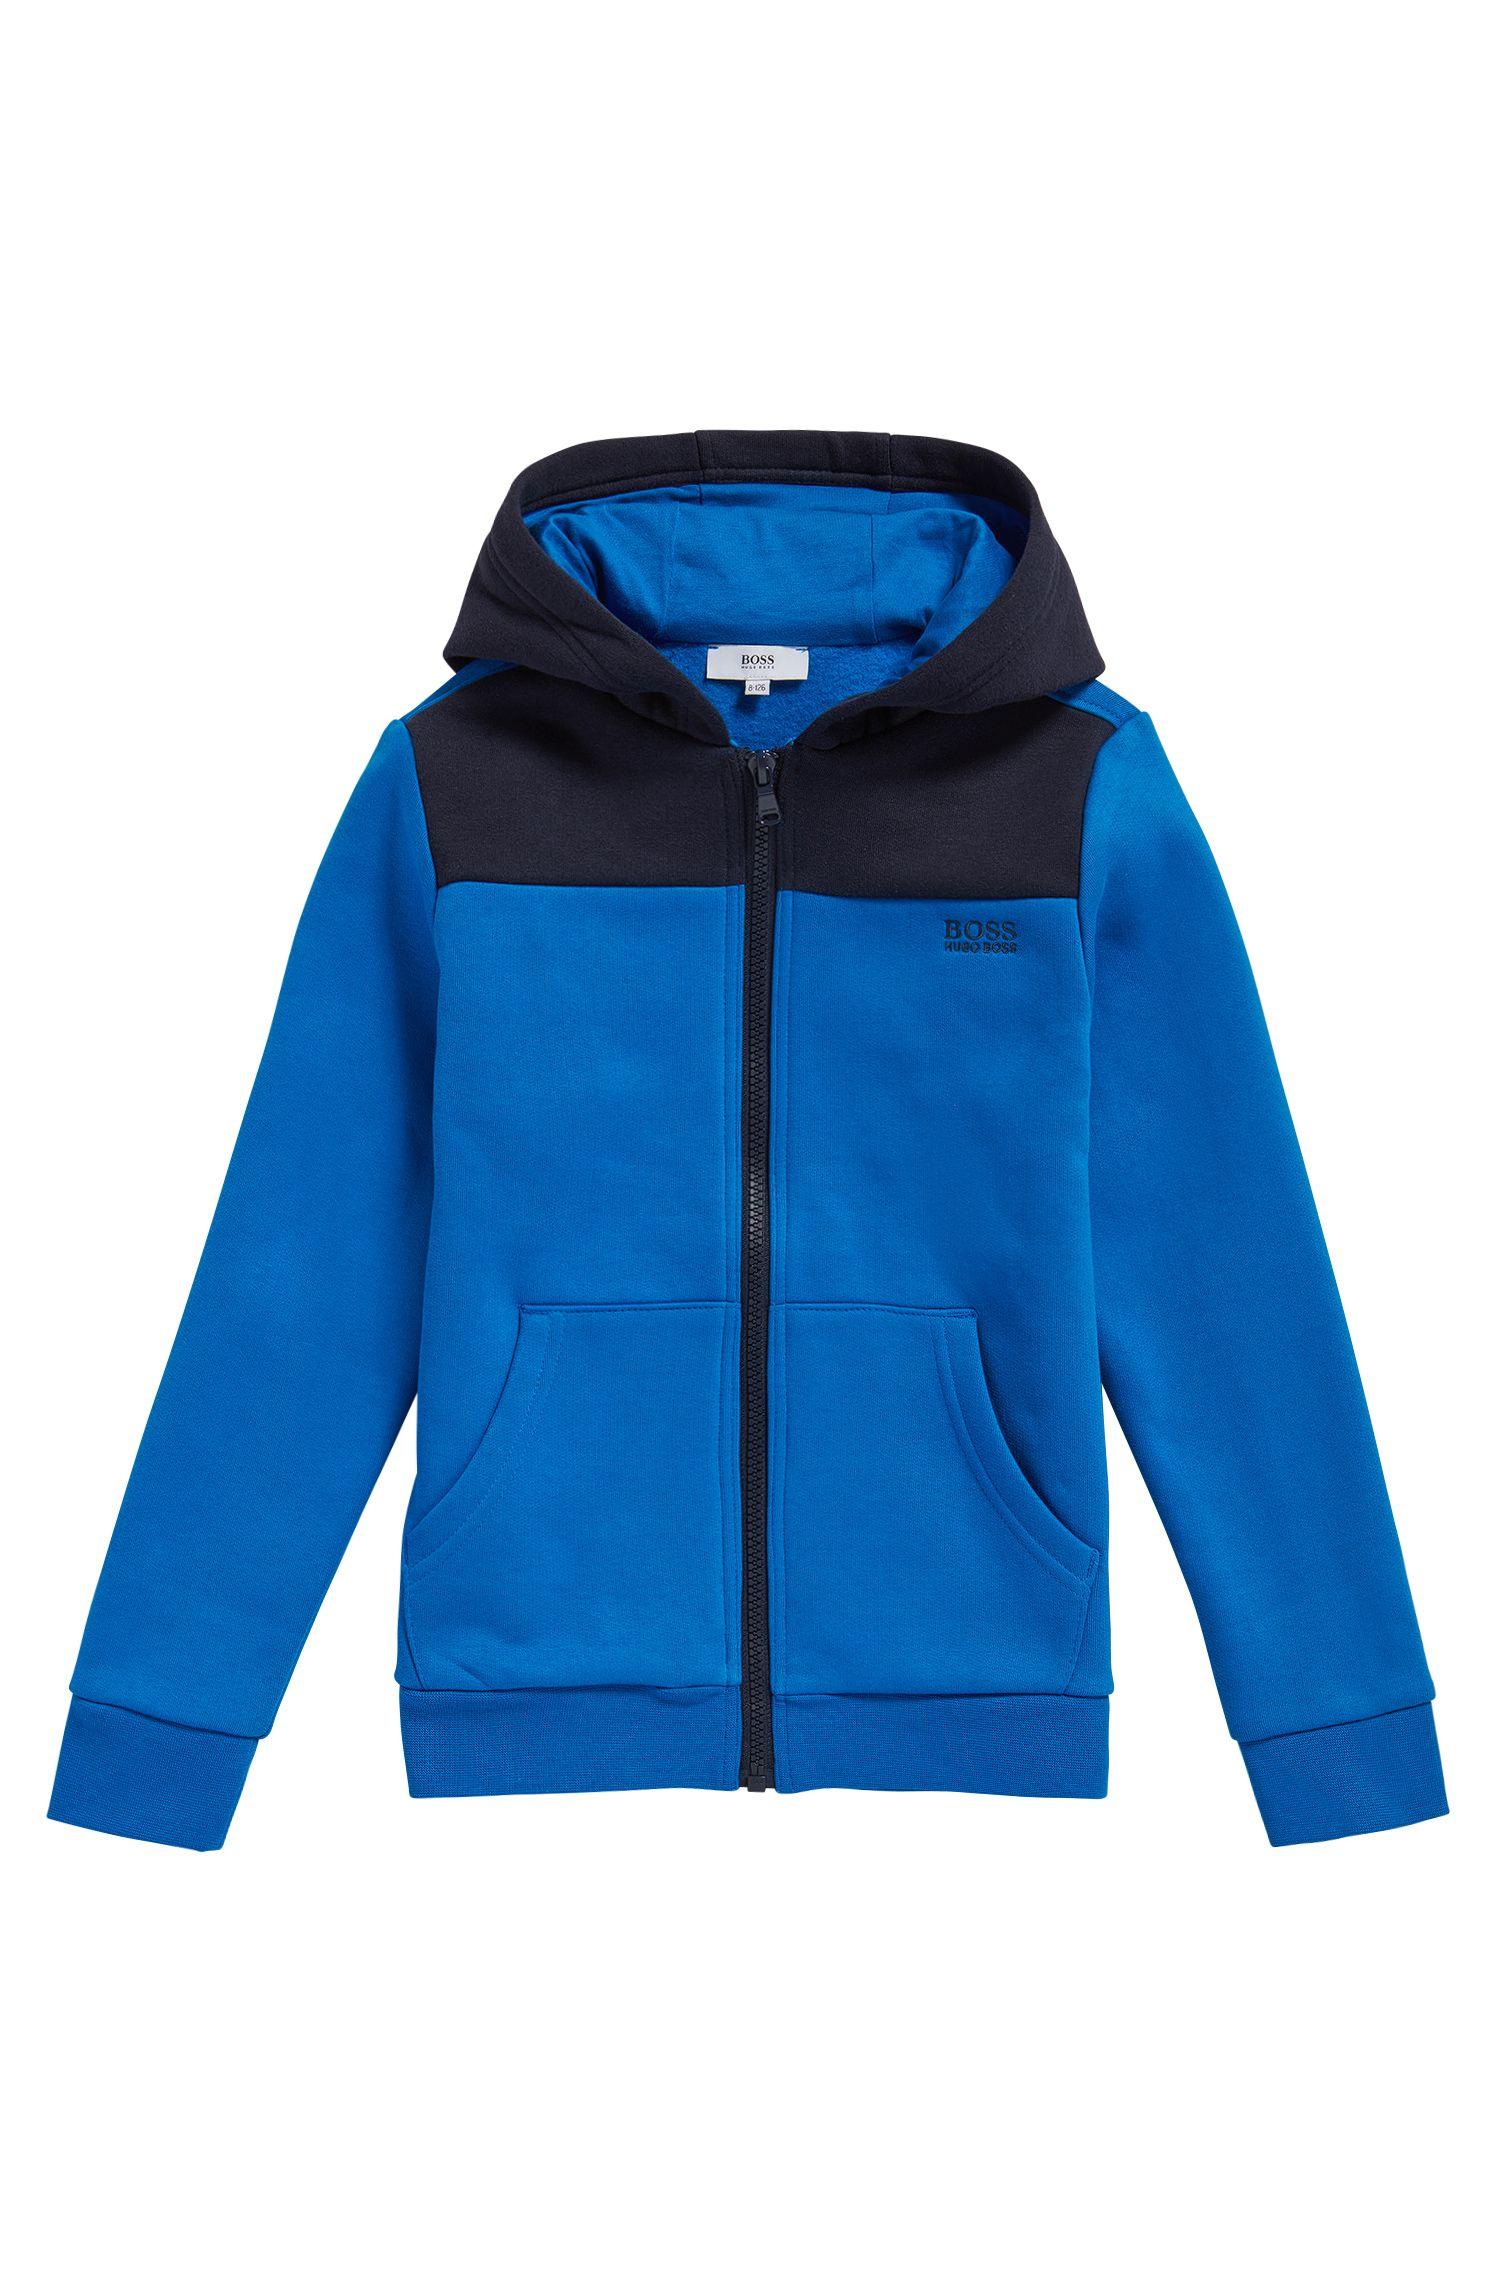 Kids-Sweatshirt-Jacke aus Baumwoll-Mix mit Kapuze: 'J25979'